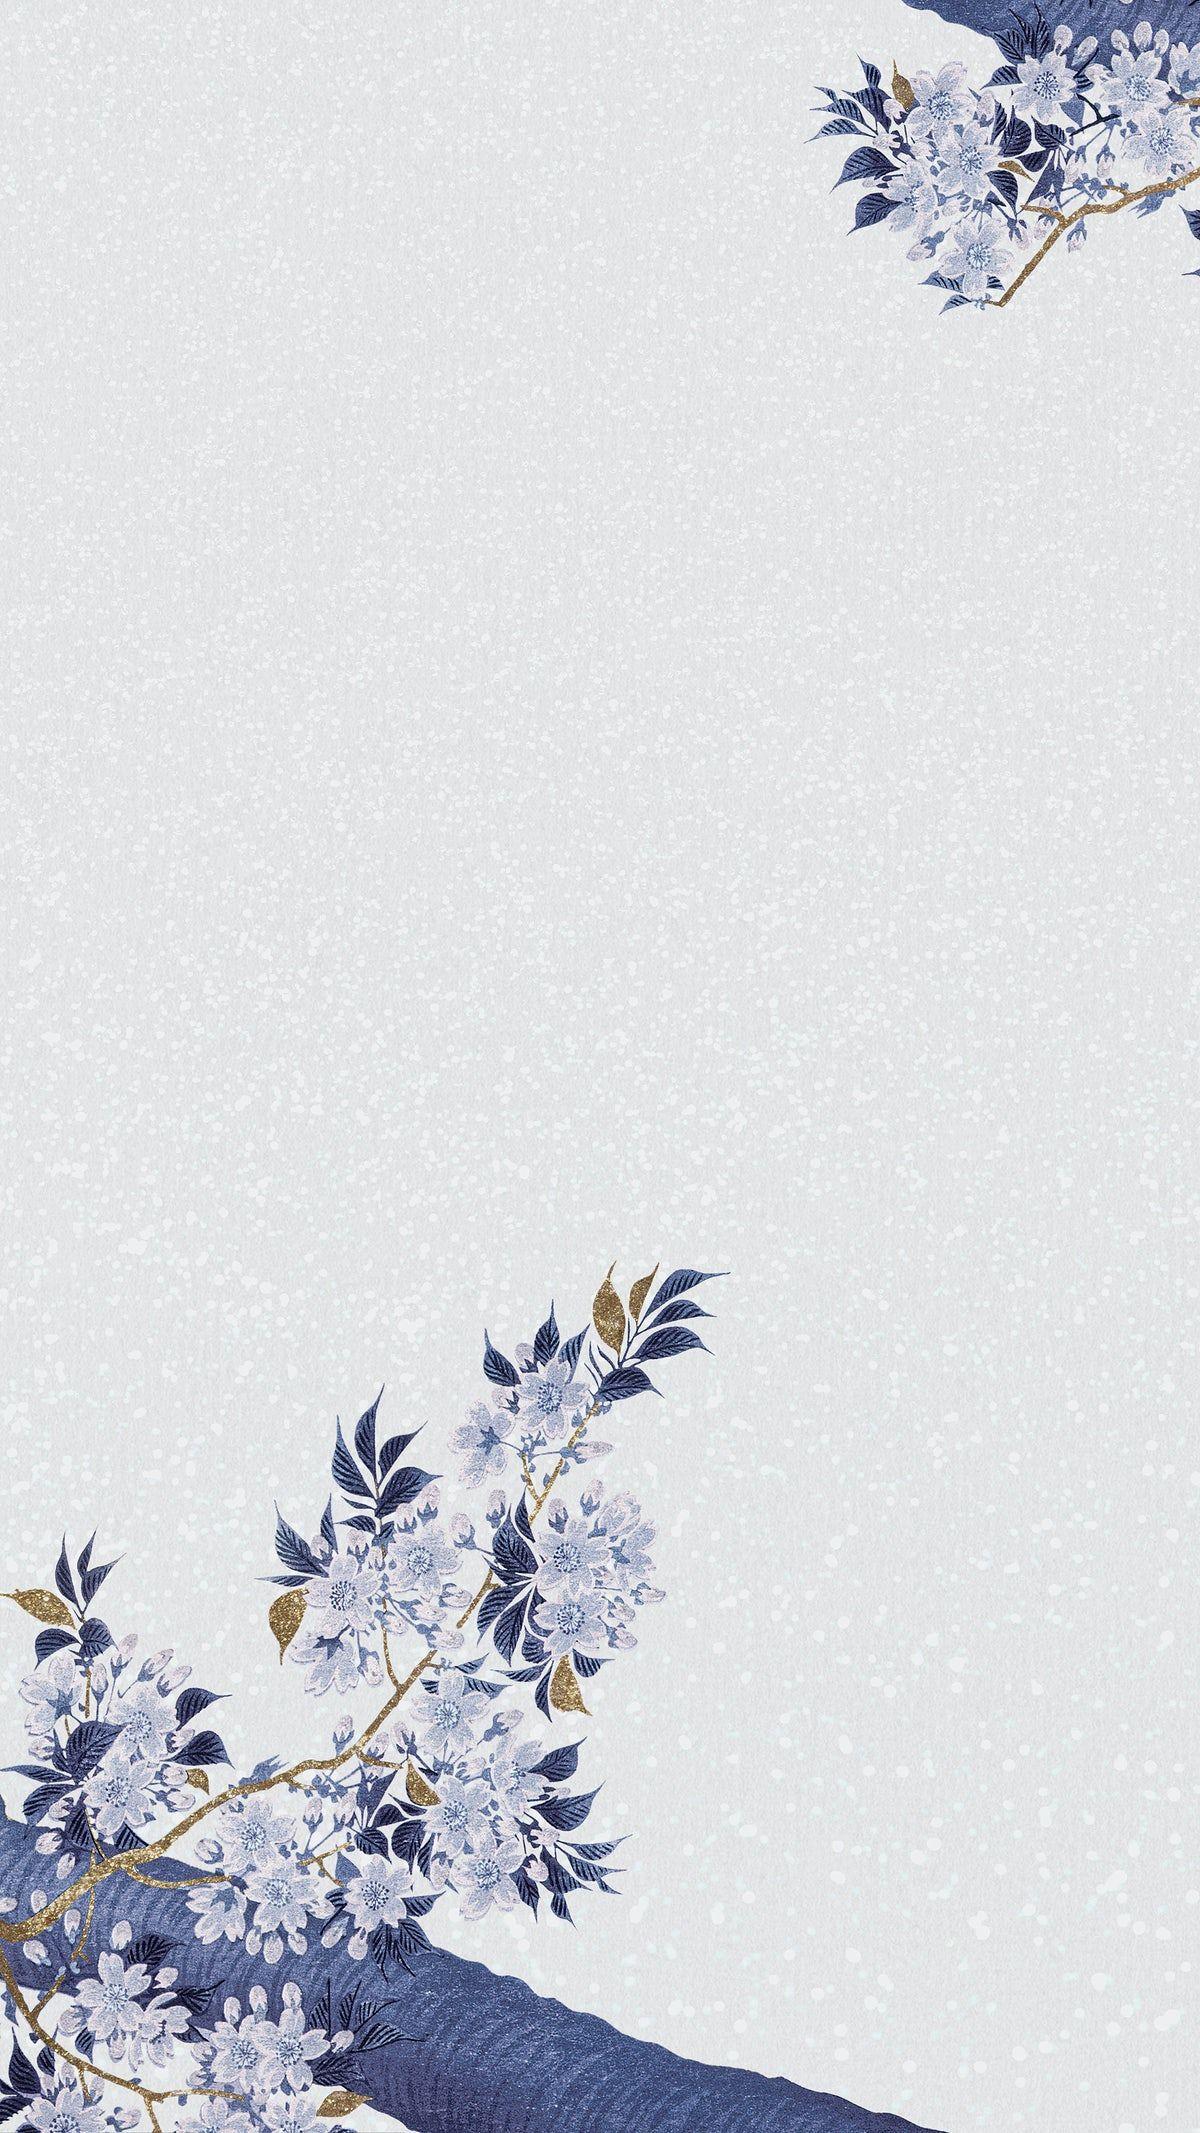 Download Premium Illustration Of Blue Cherry Blossom Branch Illustration Blue Cherry Cherry Blossom Wallpaper Cherry Blossom Branch